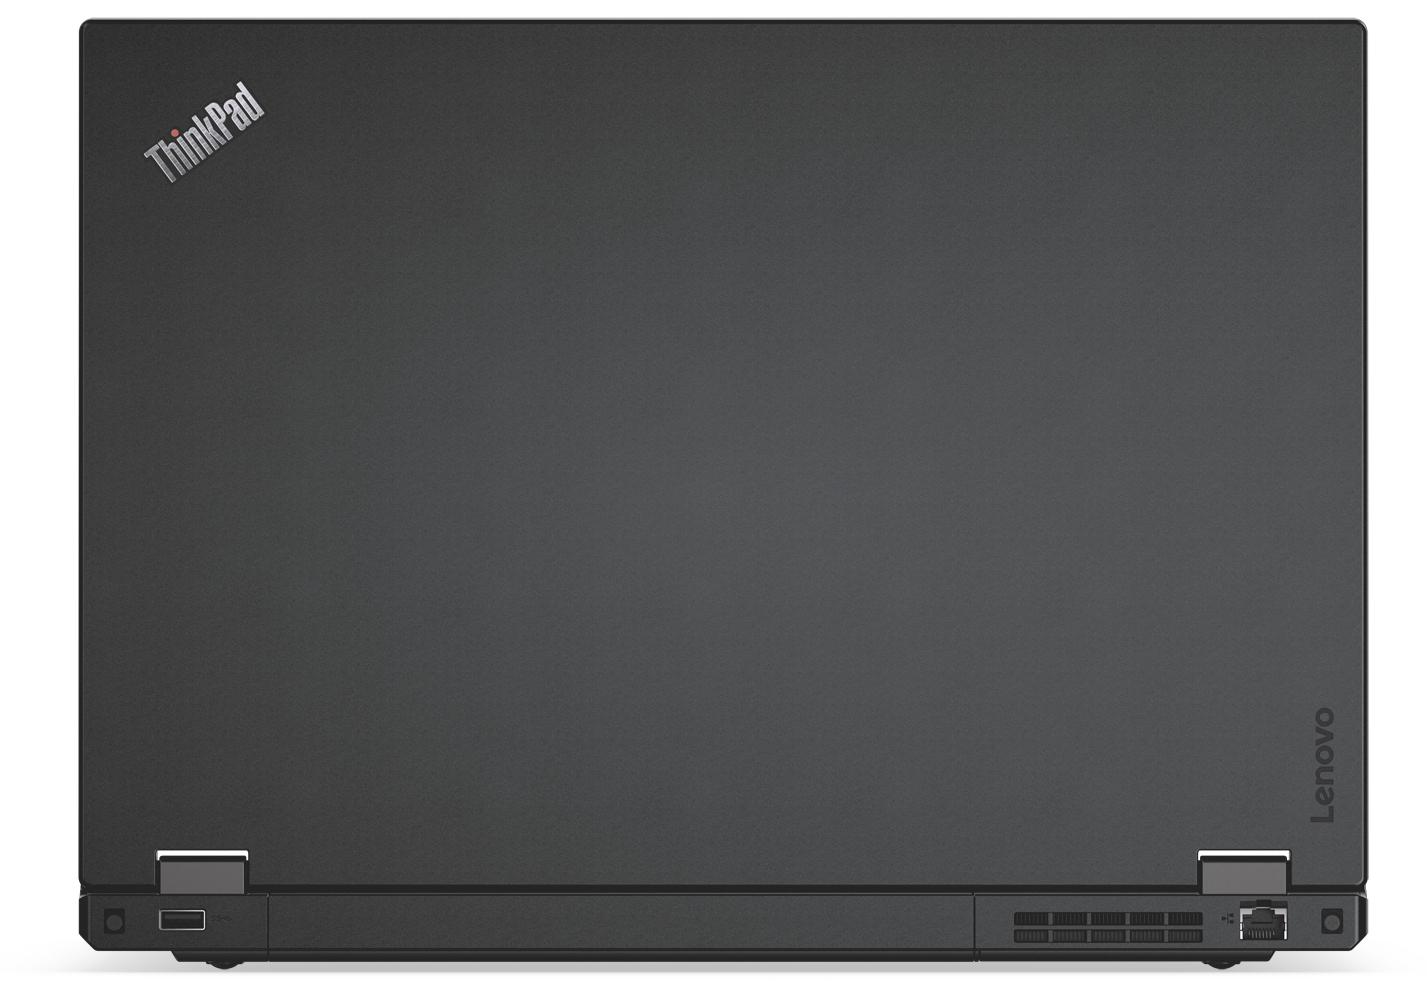 Demo Lenovo ThinkPad L570 - 7th gen Core i5 – 8GB DDR4 – 15.6'' Full HD – Bluetech 021 9488230